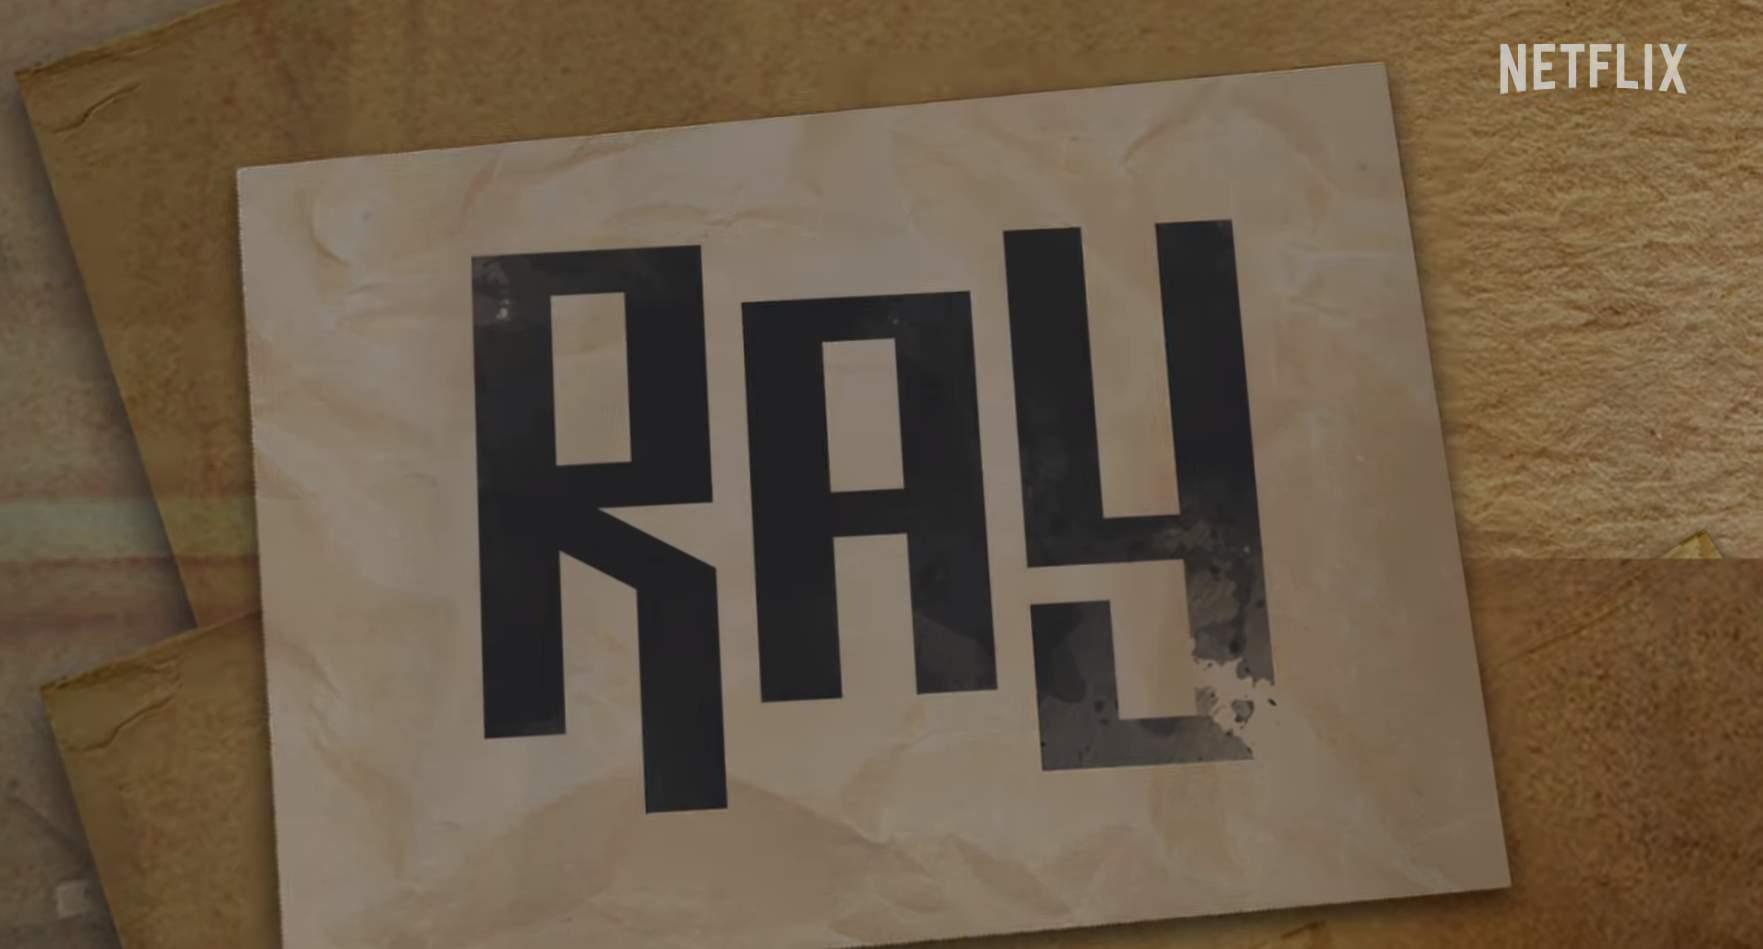 """Ray"" Season 2 Release Date | Will Netflix Renew The Series For Season 2? | Manoj Bajpayee, Ali Fazal & Bidita Bag"